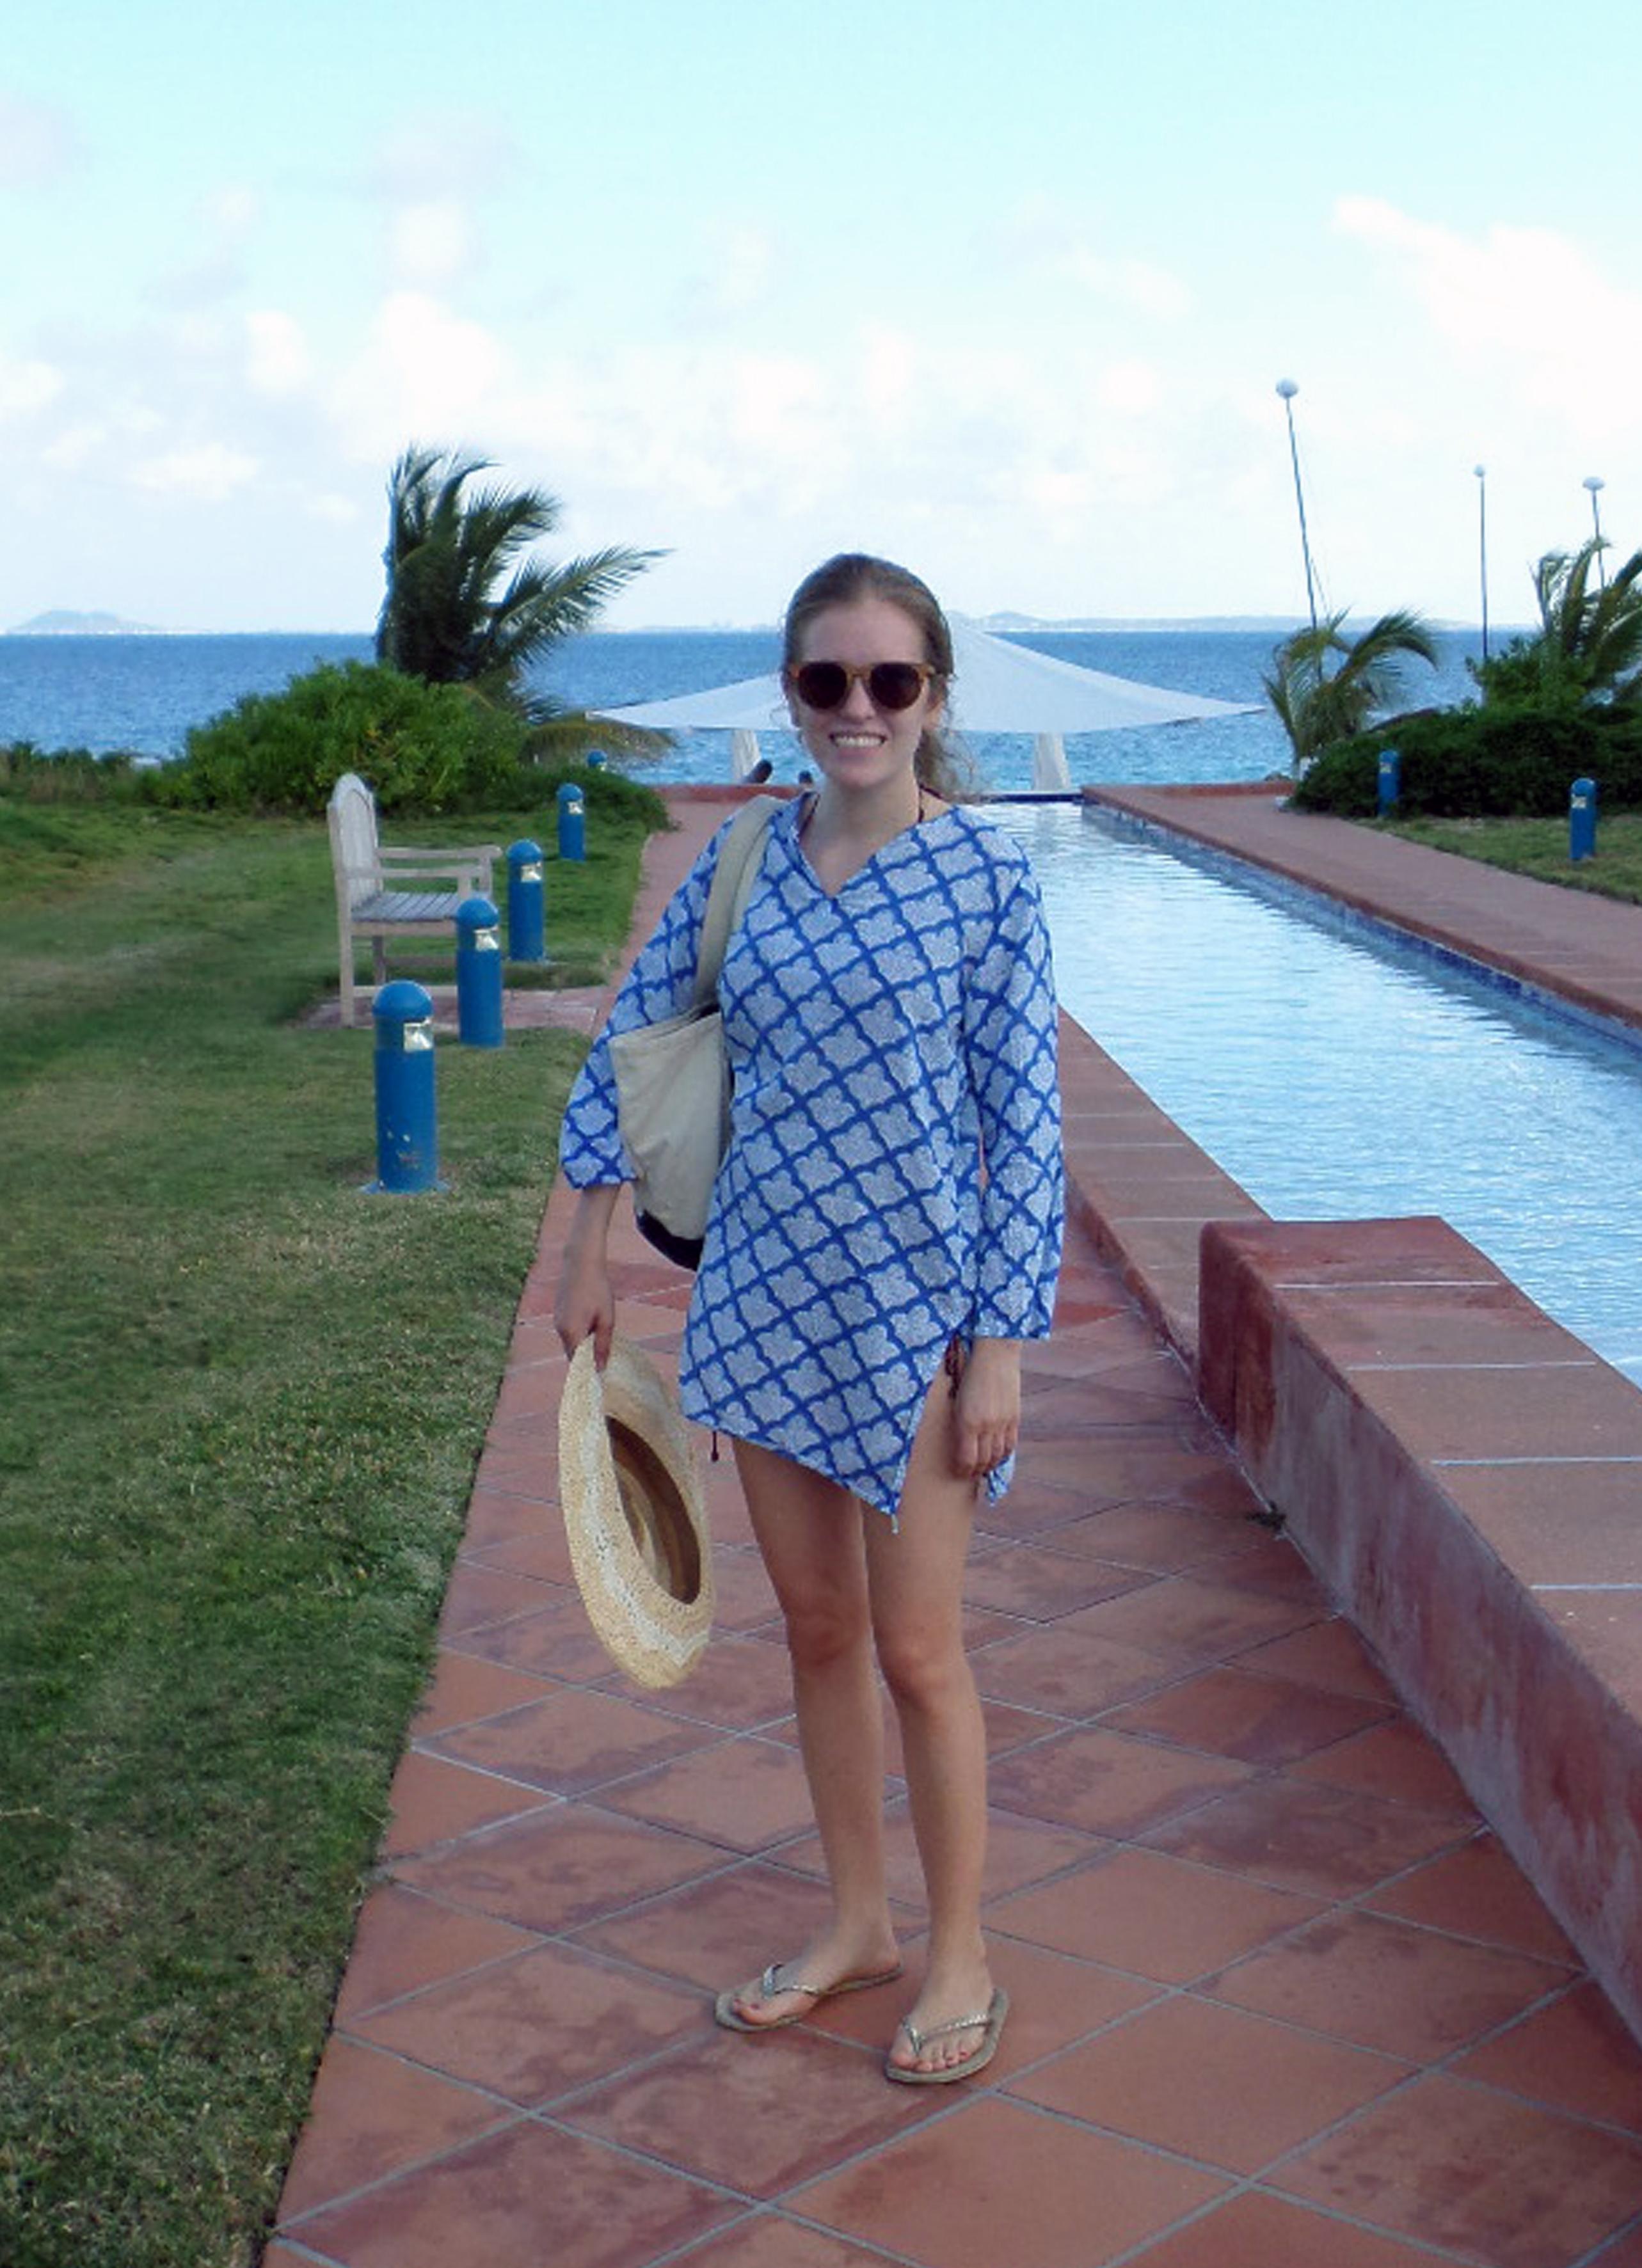 At the Cuisinart Resort